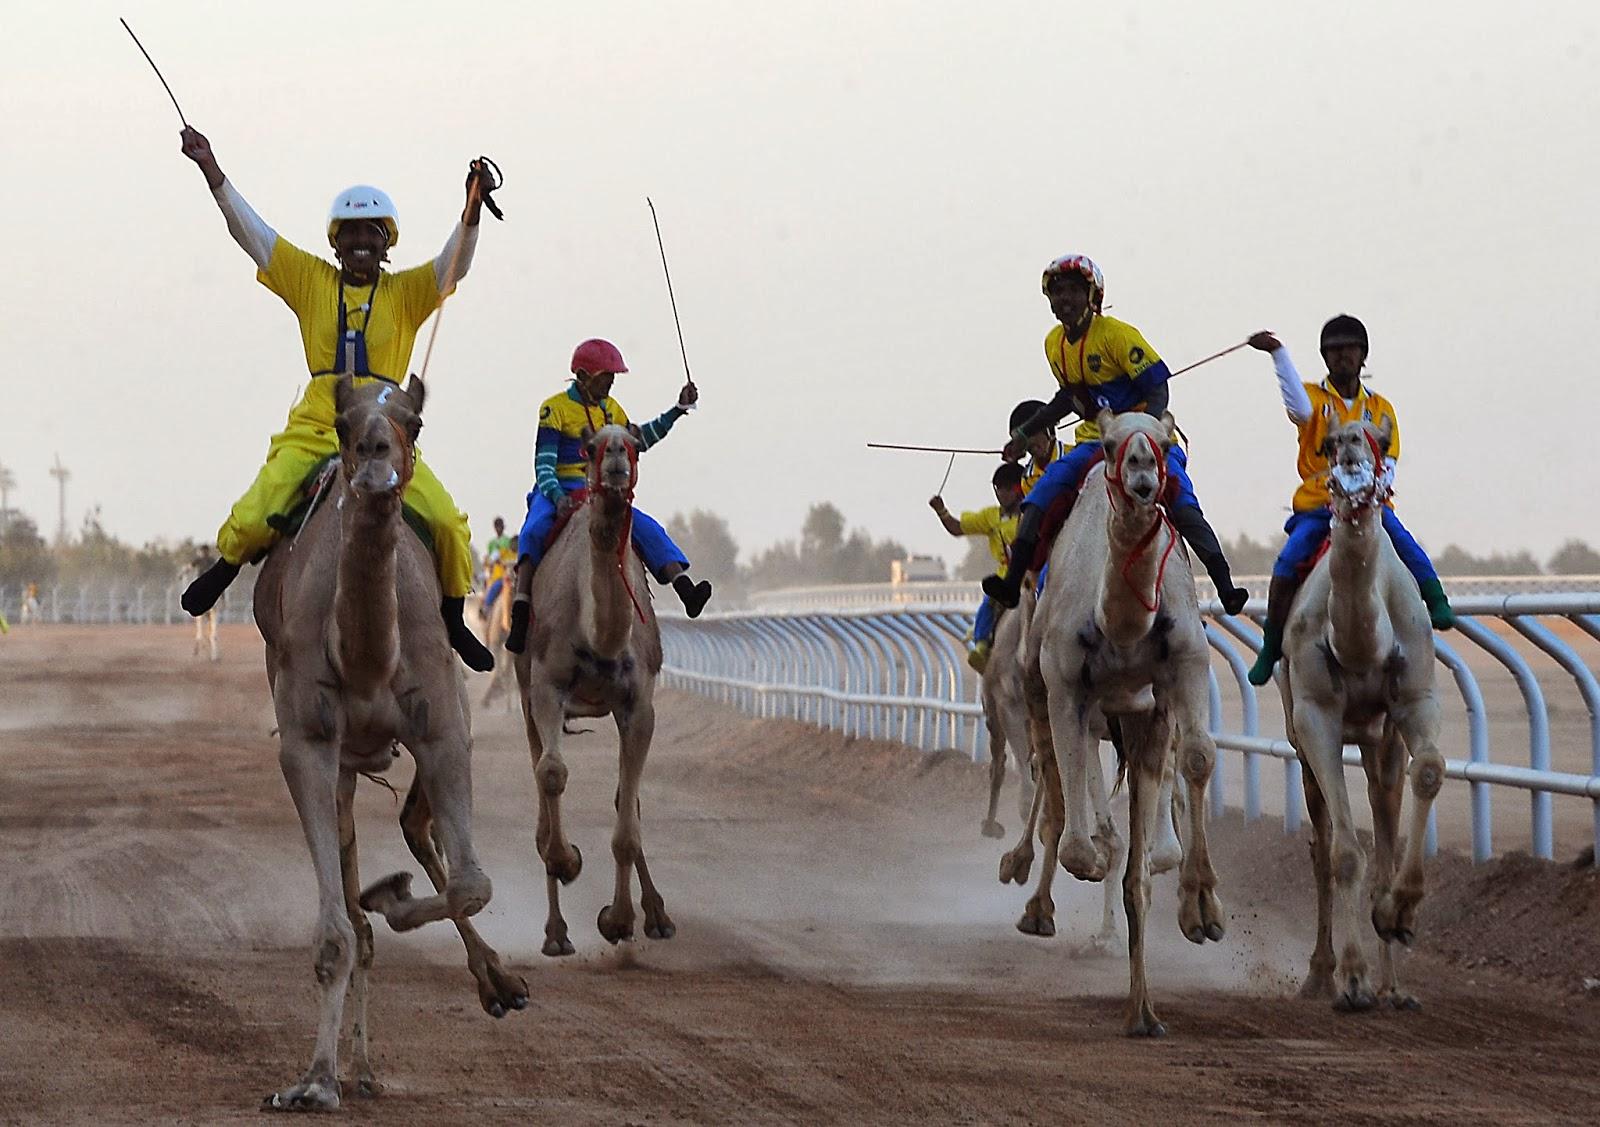 2014, Animal, Camel, Camel Race, Ceremony, Cultural, Festival, Heritage, Jenadrivah, Jockey, Race, Riders, Riyadh, Salman bin Abdulaziz, Saudi Arabia, Sports,